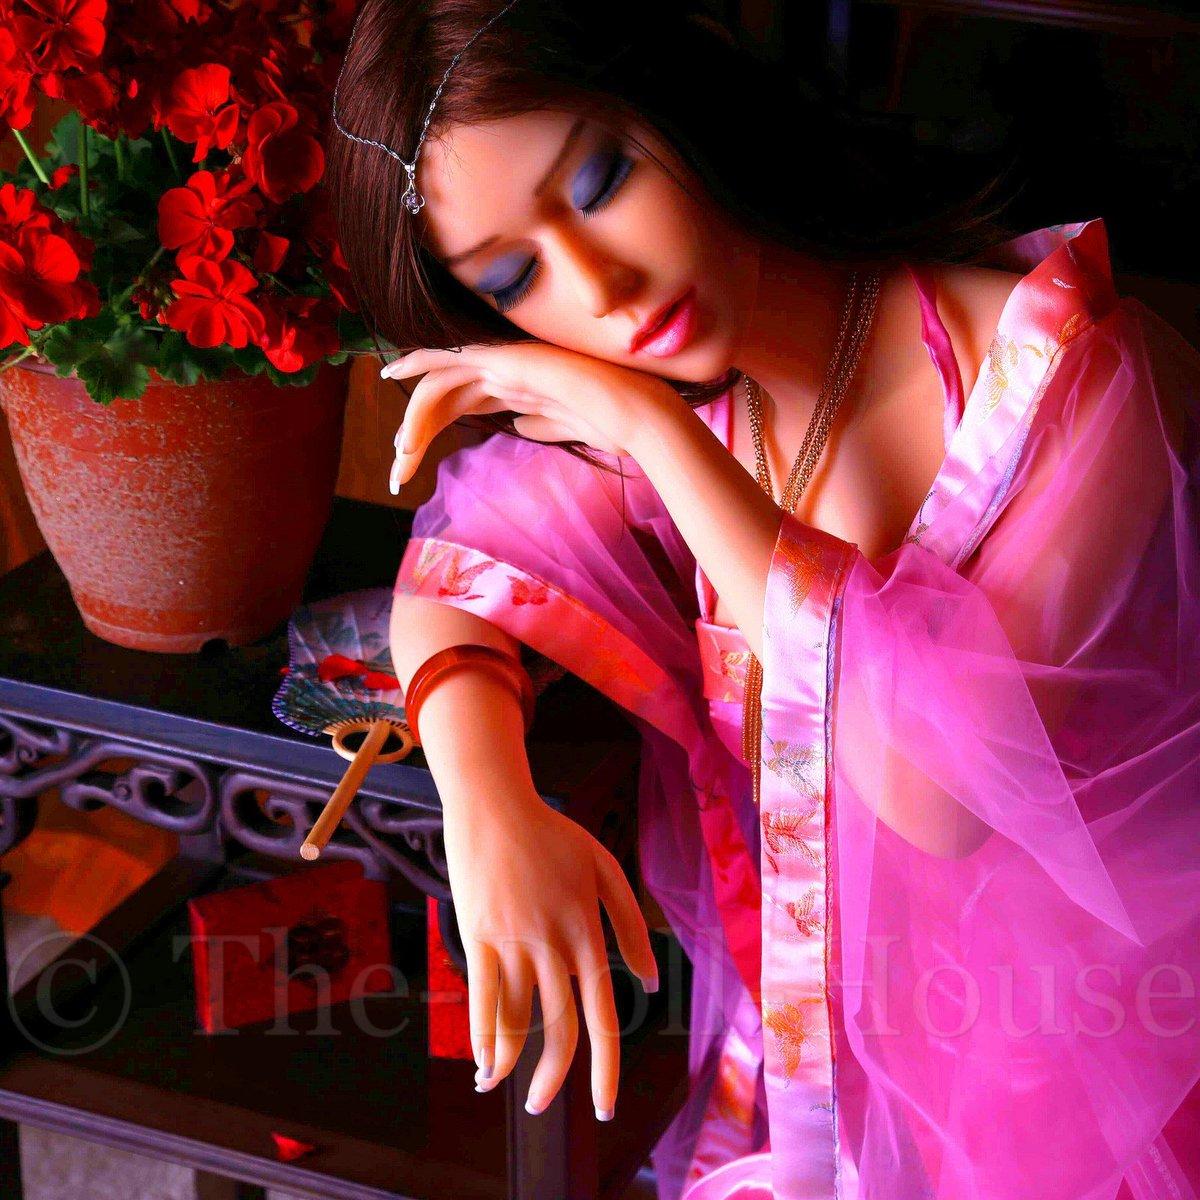 Oriental sex doll